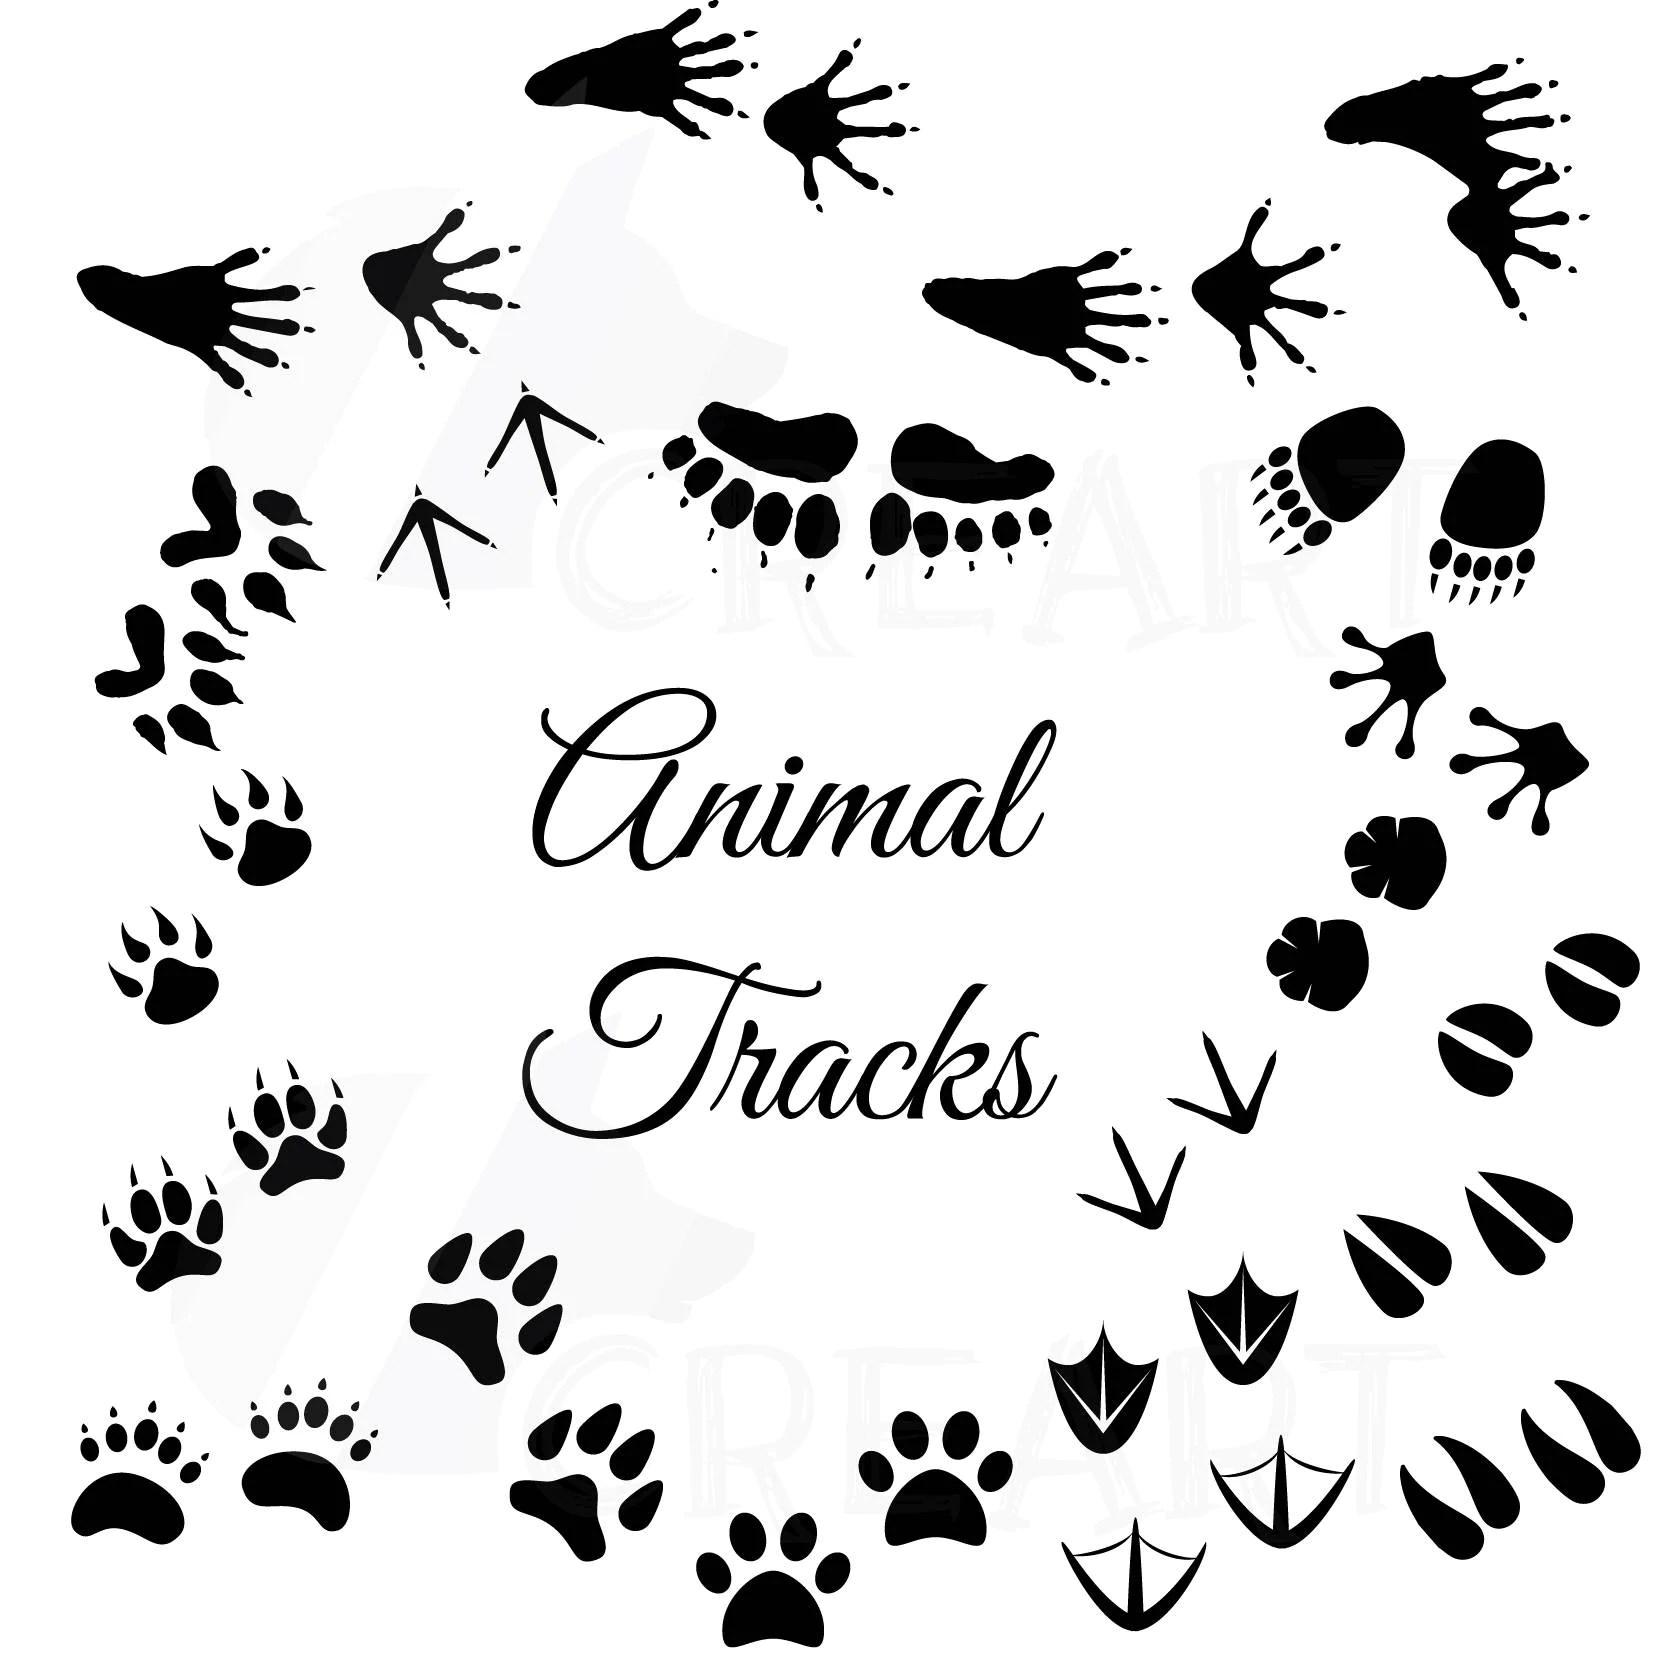 Animal Tracks Woodland Animals Footprints Clipart Pack